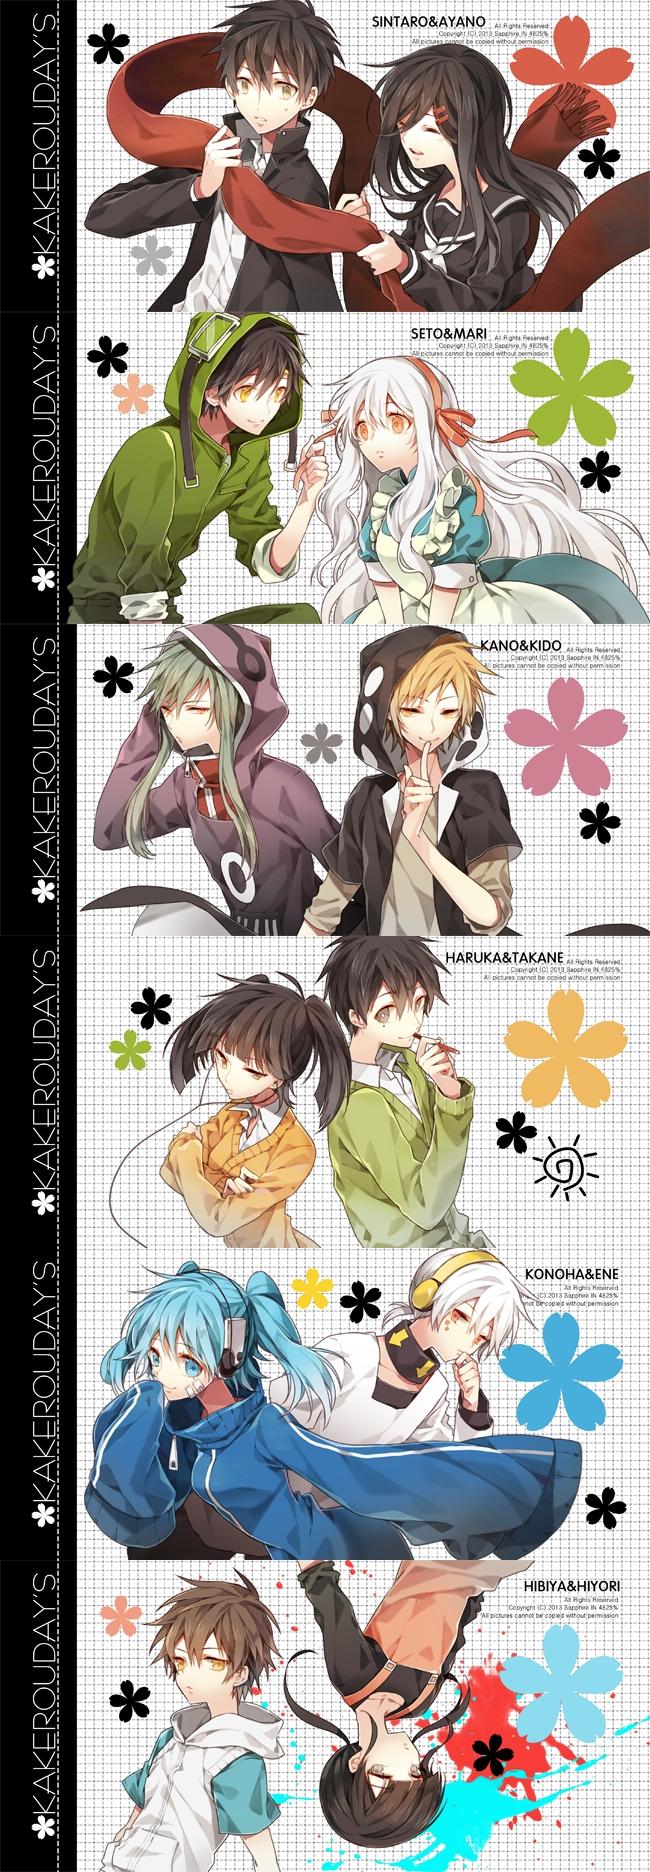 Tags: Anime, NINE (Sapphire), Kagerou Project, Seto Kousuke, Asahina Hiyori, Kisaragi Shintaro, Kido Tsubomi, Enomoto Takane, Kano Shuuya, Amamiya Hibiya, Kokonose